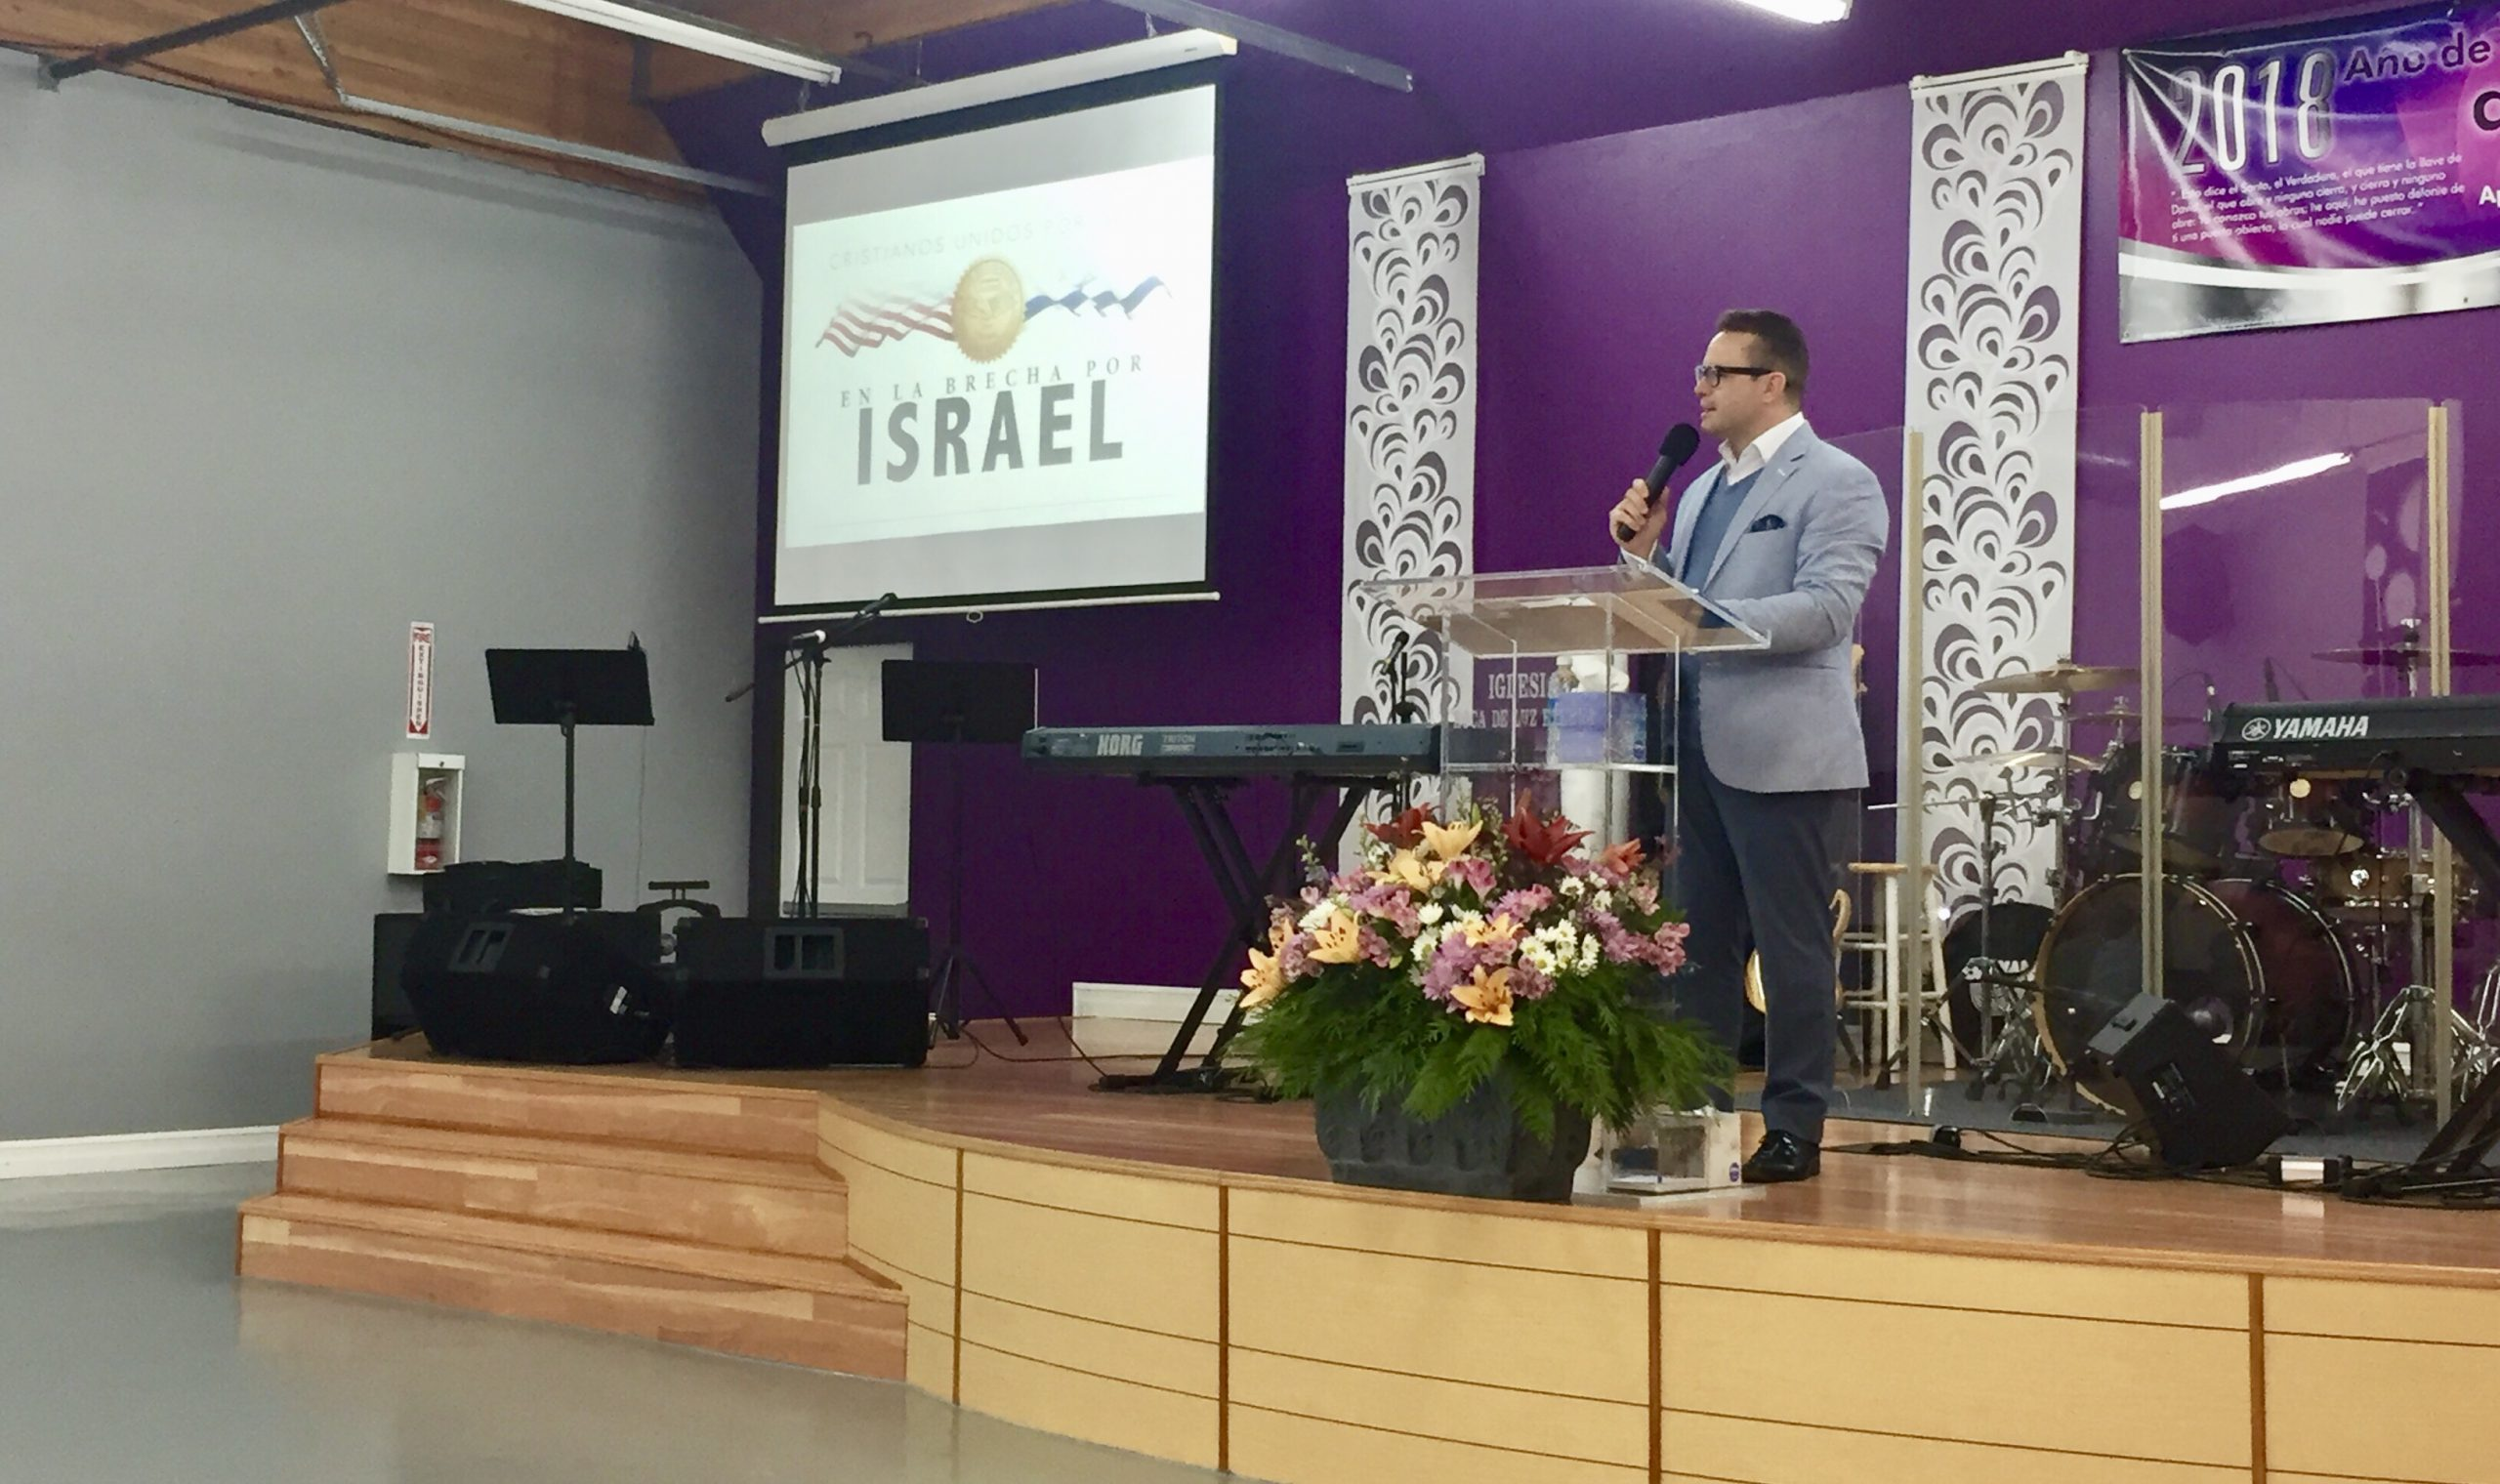 Feb 7 Hillsboro, OR Spanish Stand With Israel